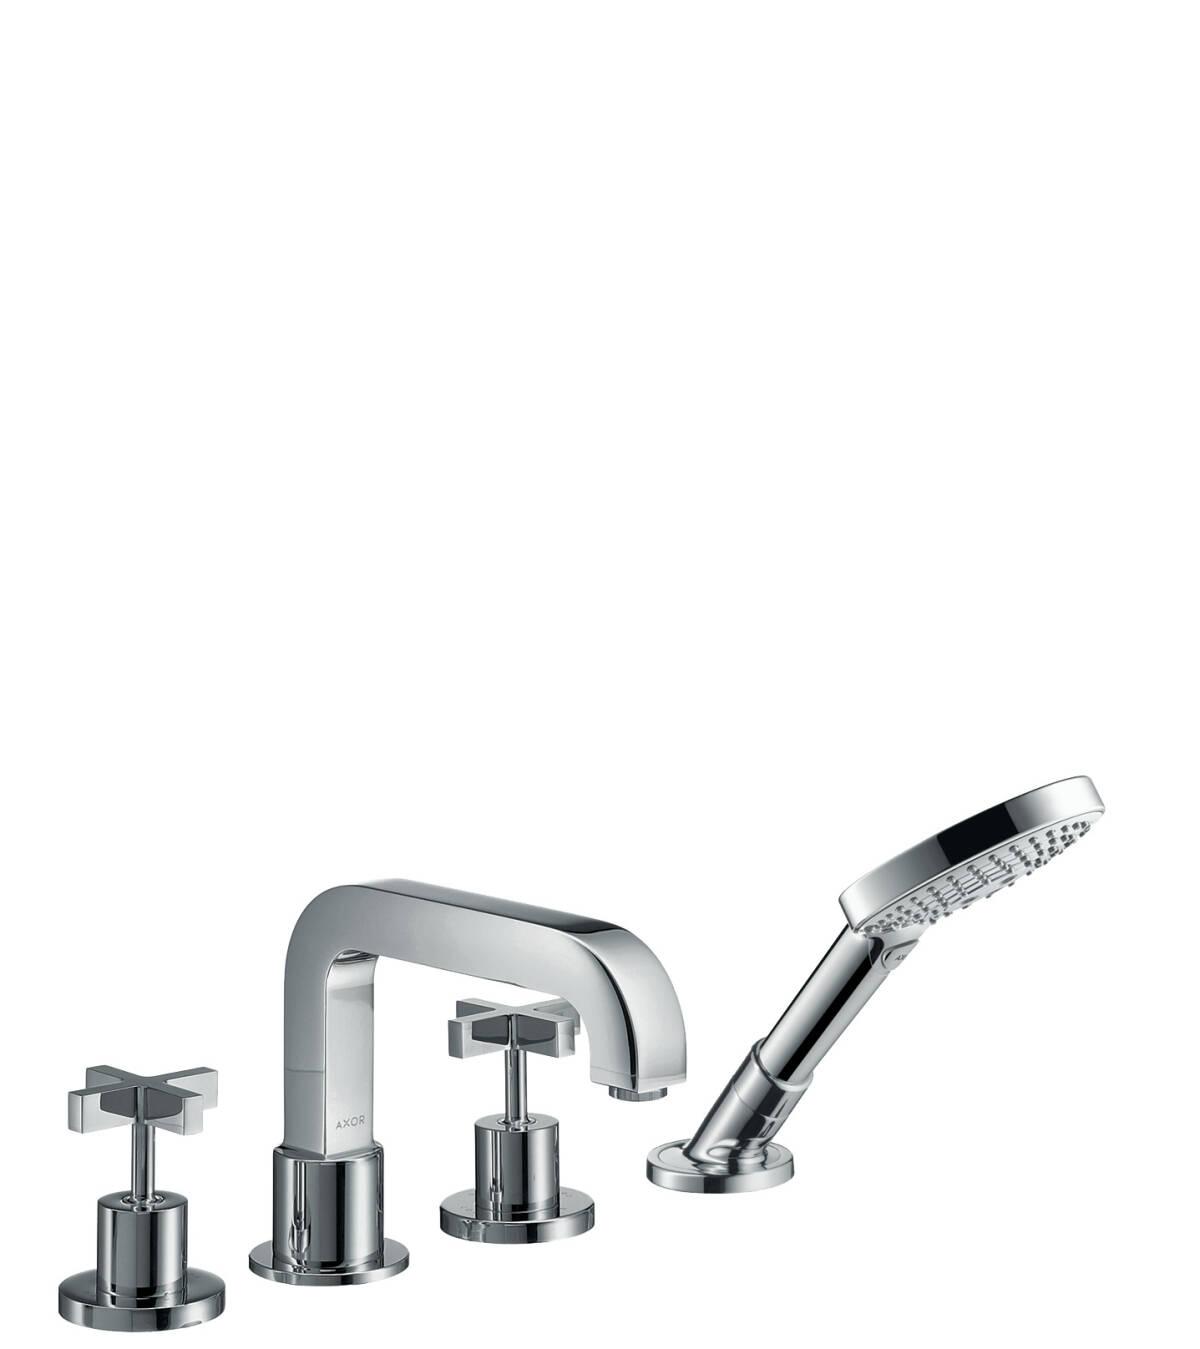 4-hole rim mounted bath mixer with cross handles and escutcheons, Chrome, 39445000